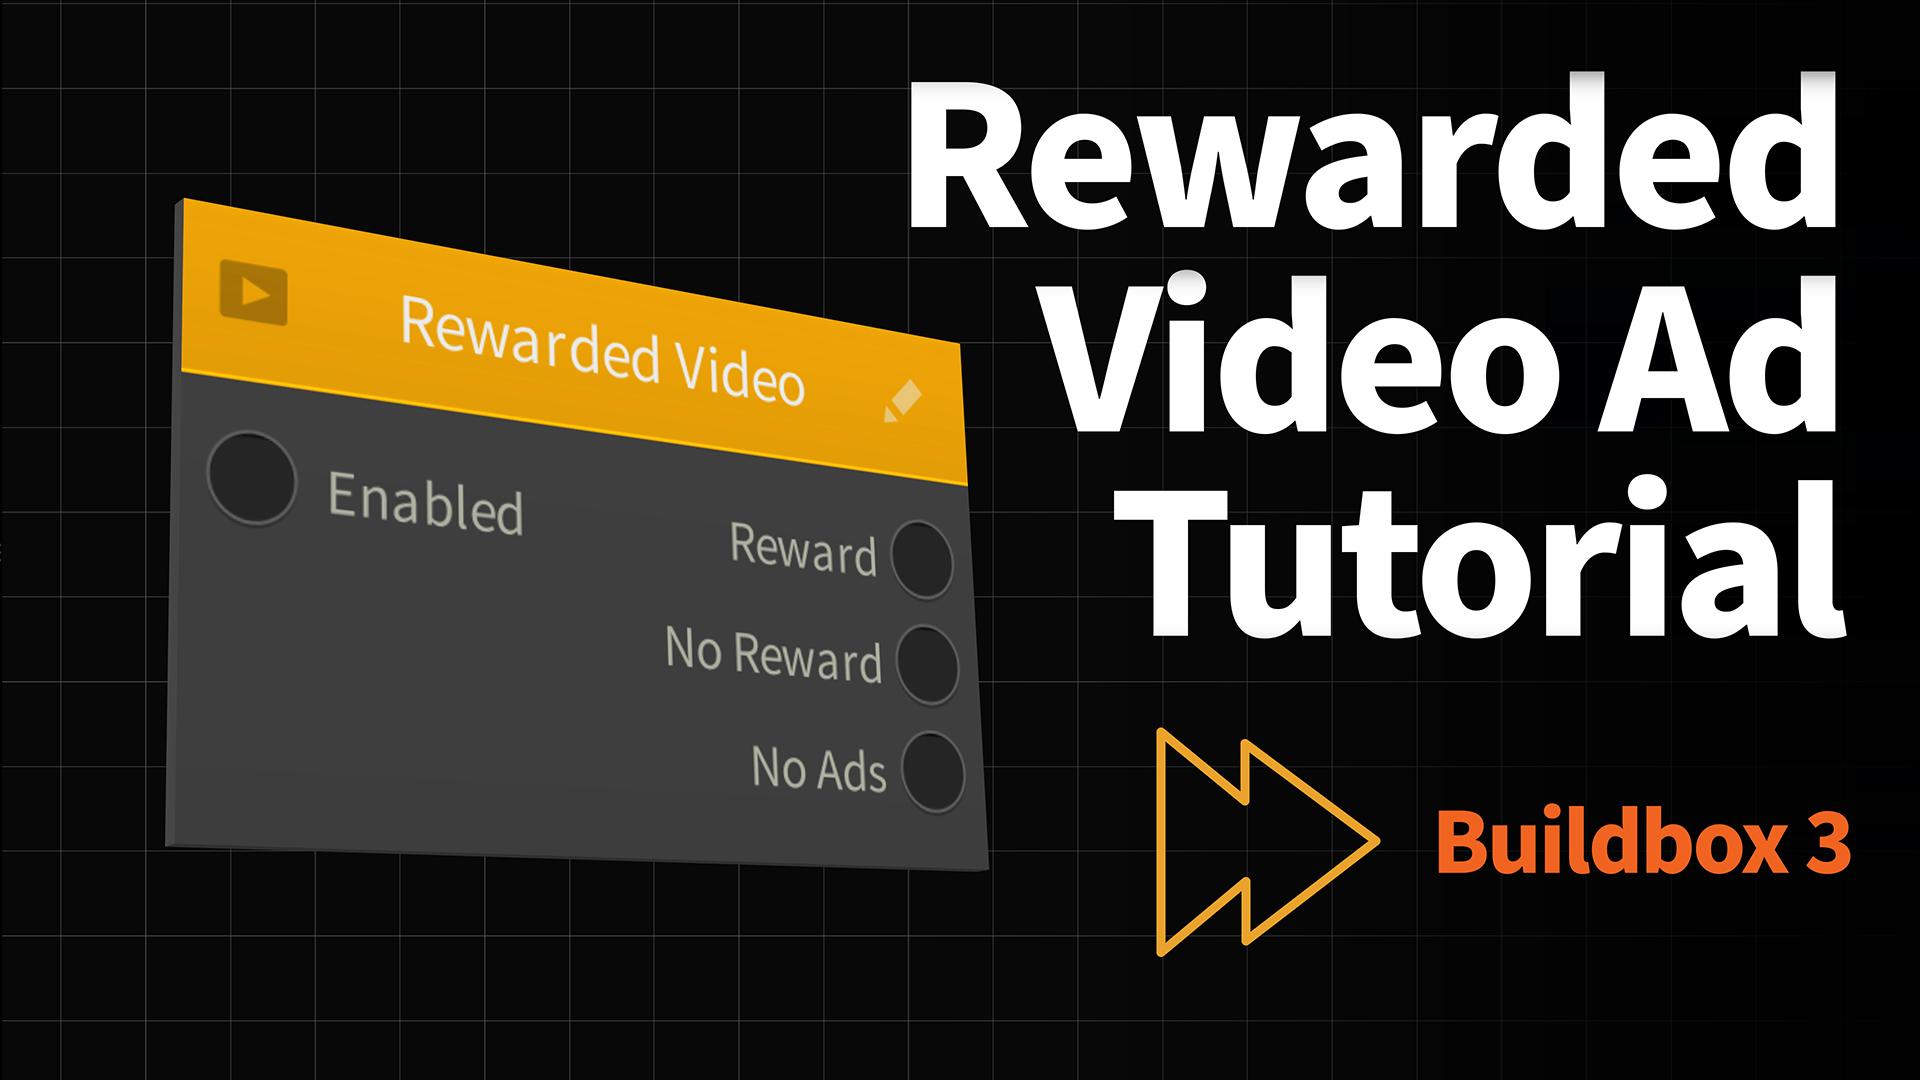 Rewarded Video Ad